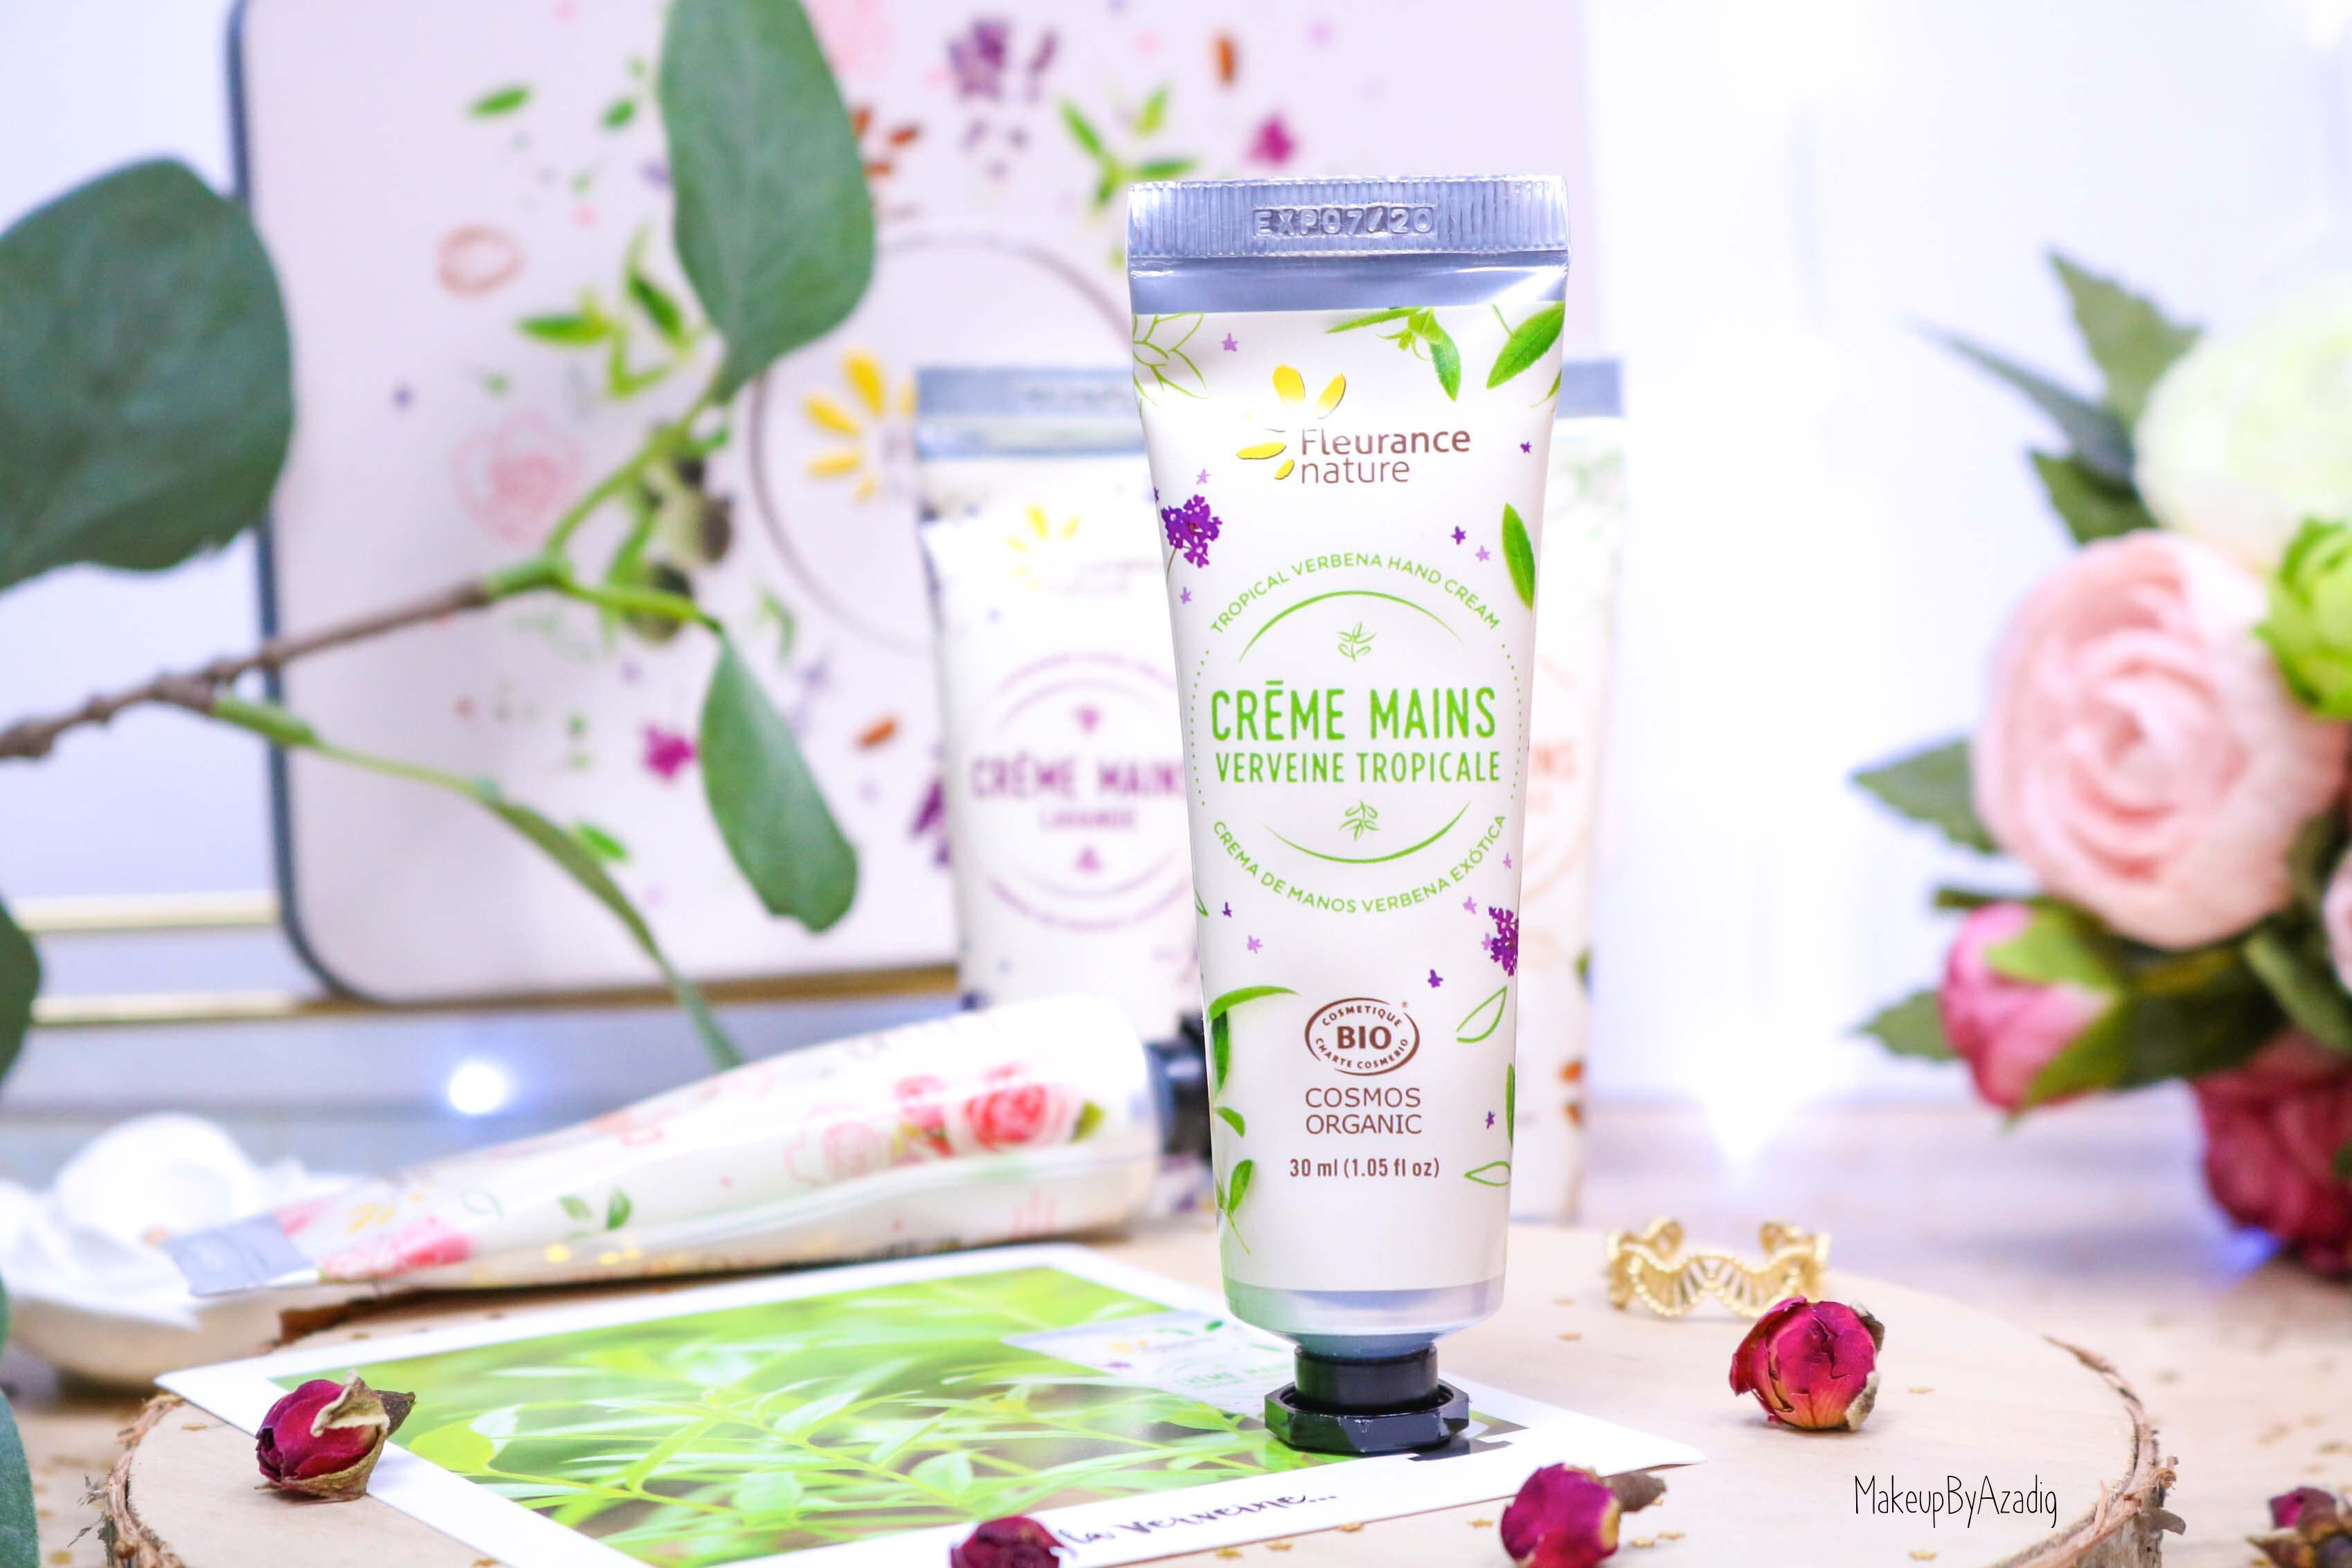 revue-creme-hydratante-reparatrice-mains-hand-bio-beaute-fleurance-nature-makeupbyazadig-verveine-lavande-rose-amande-tropicale